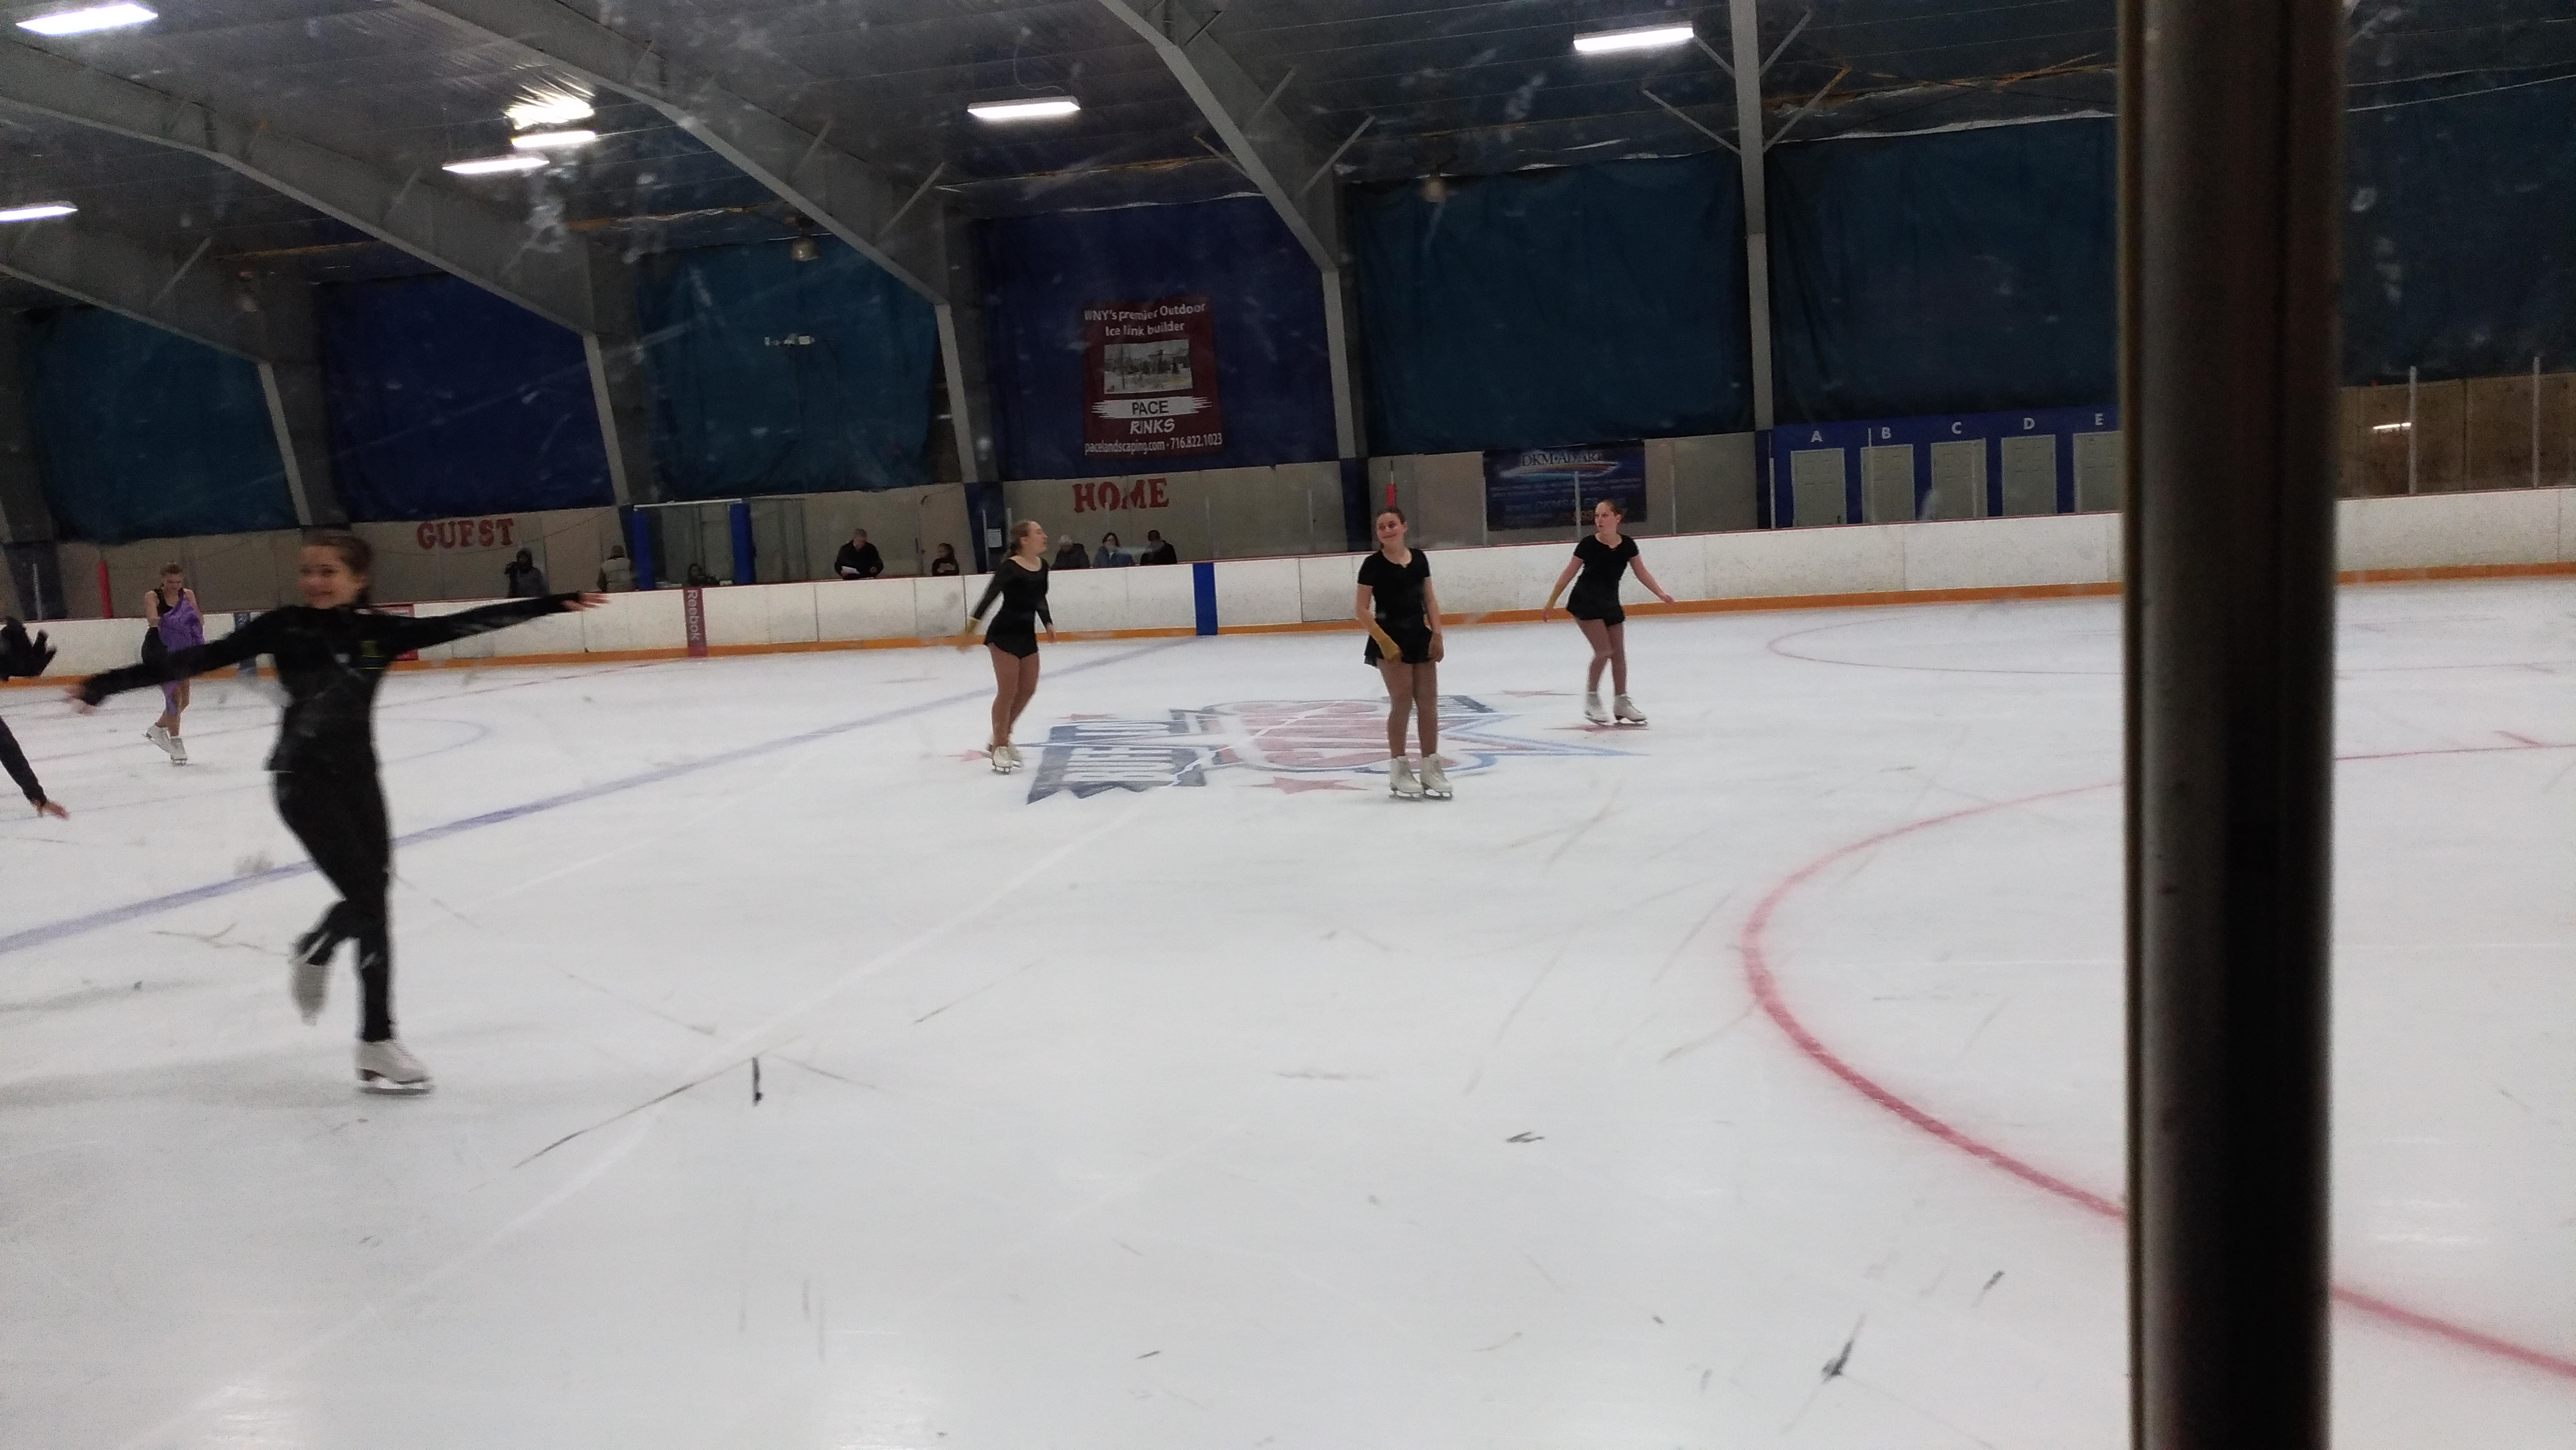 Roller skating rink etobicoke - Zoe Junie Zara And Janis